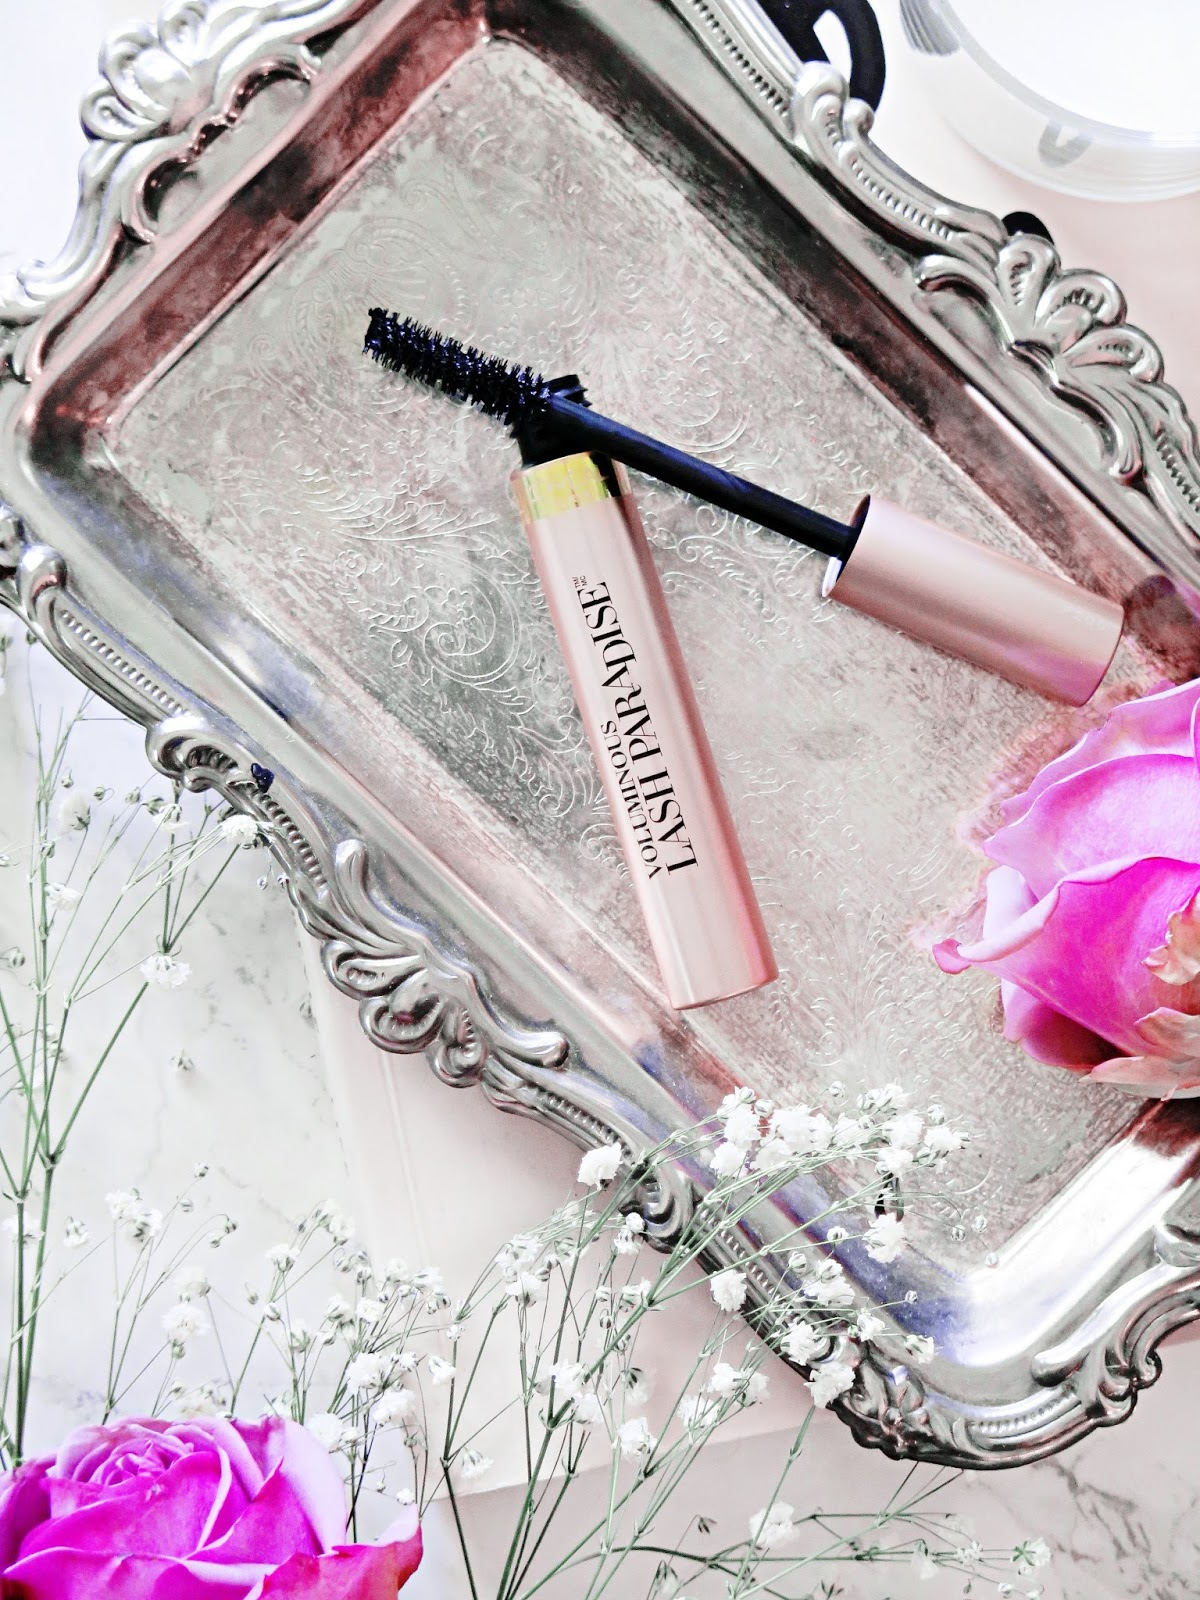 Take Your Lashes to Paradise | L'Oreal Paris Voluminous Lash Paradise Mascara | Review & Demo | www.labellesirene.ca